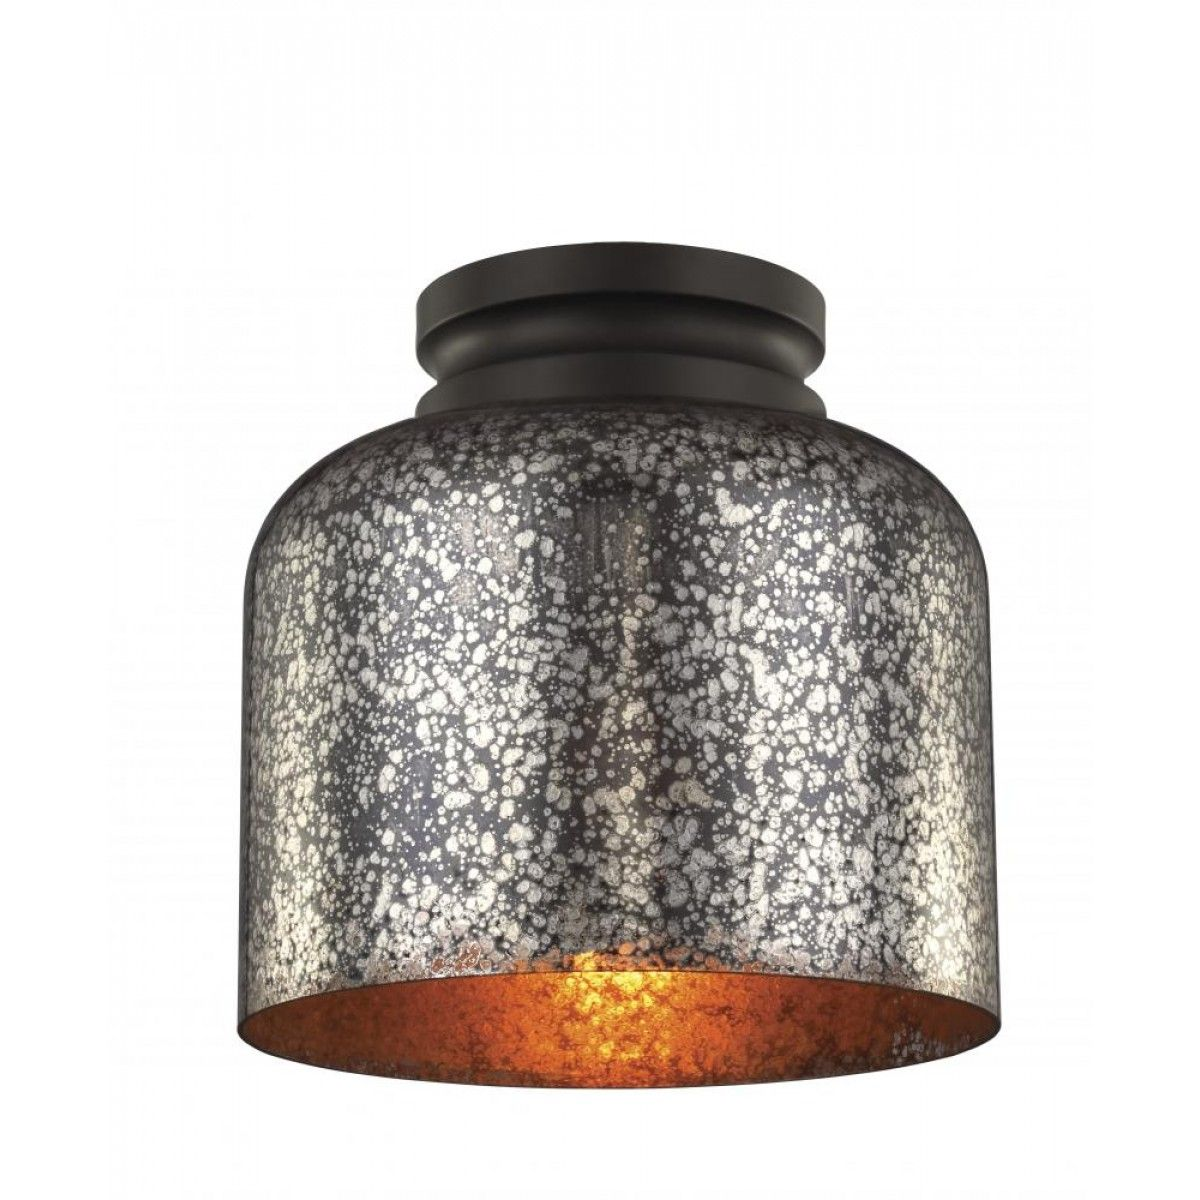 1 - Light Hounslow Flushmount